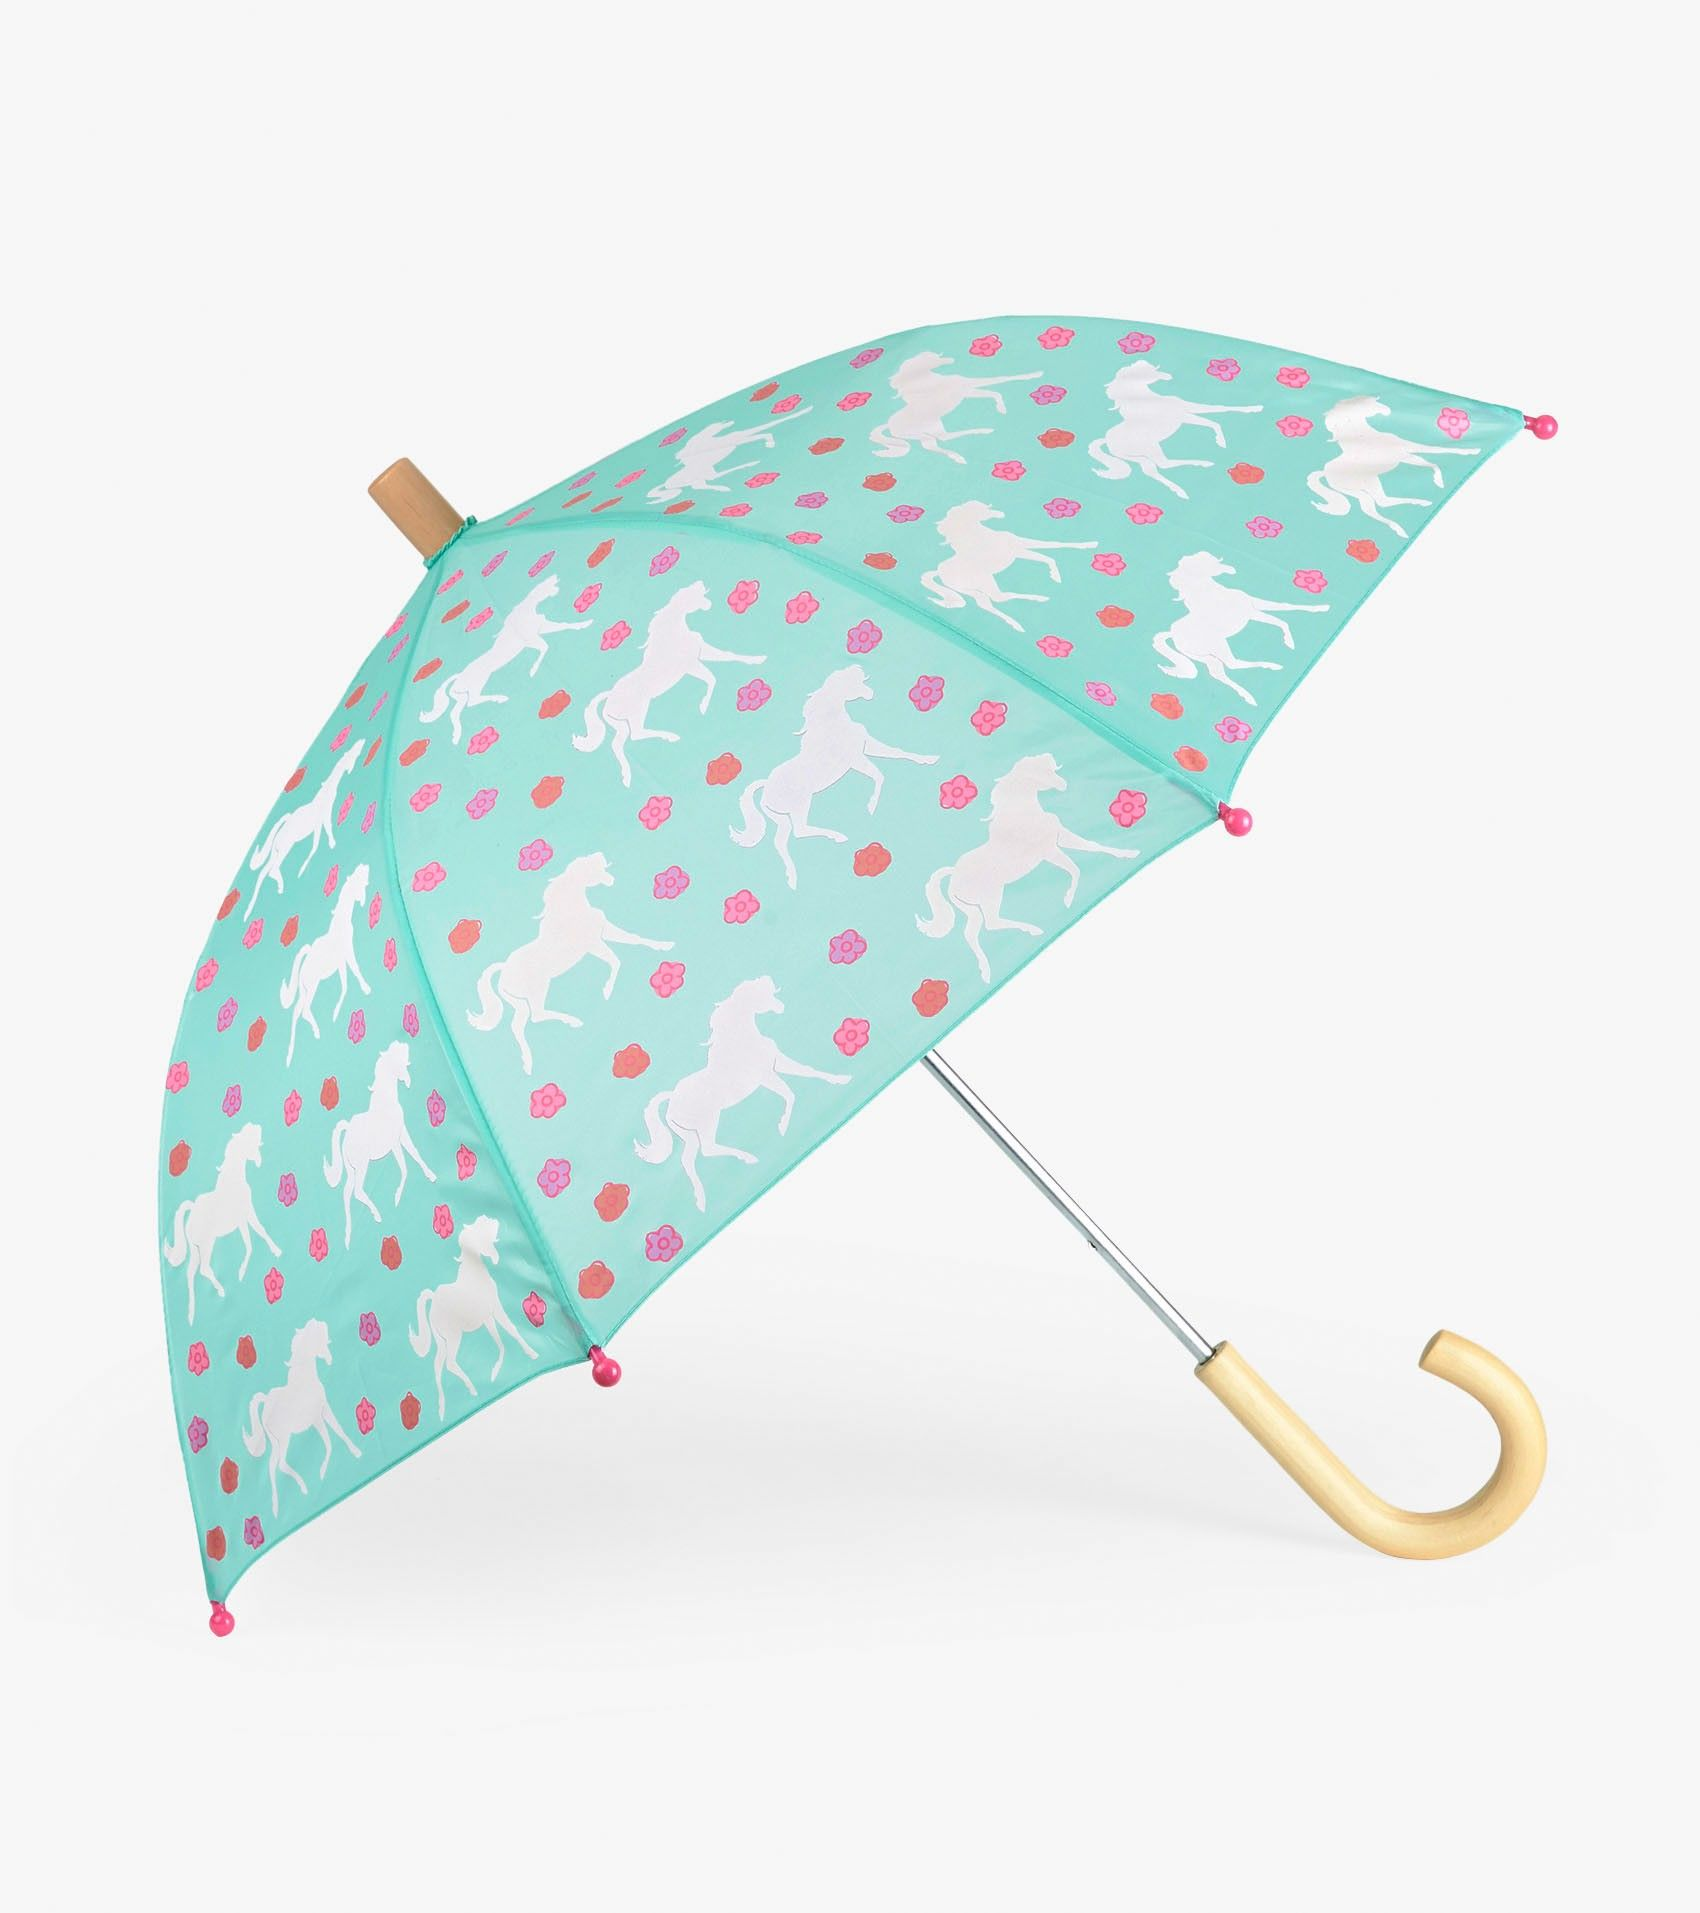 1e0722d1495a8 Galloping Horses Umbrella by Hatley | We ❤ rain | Rain wear ...